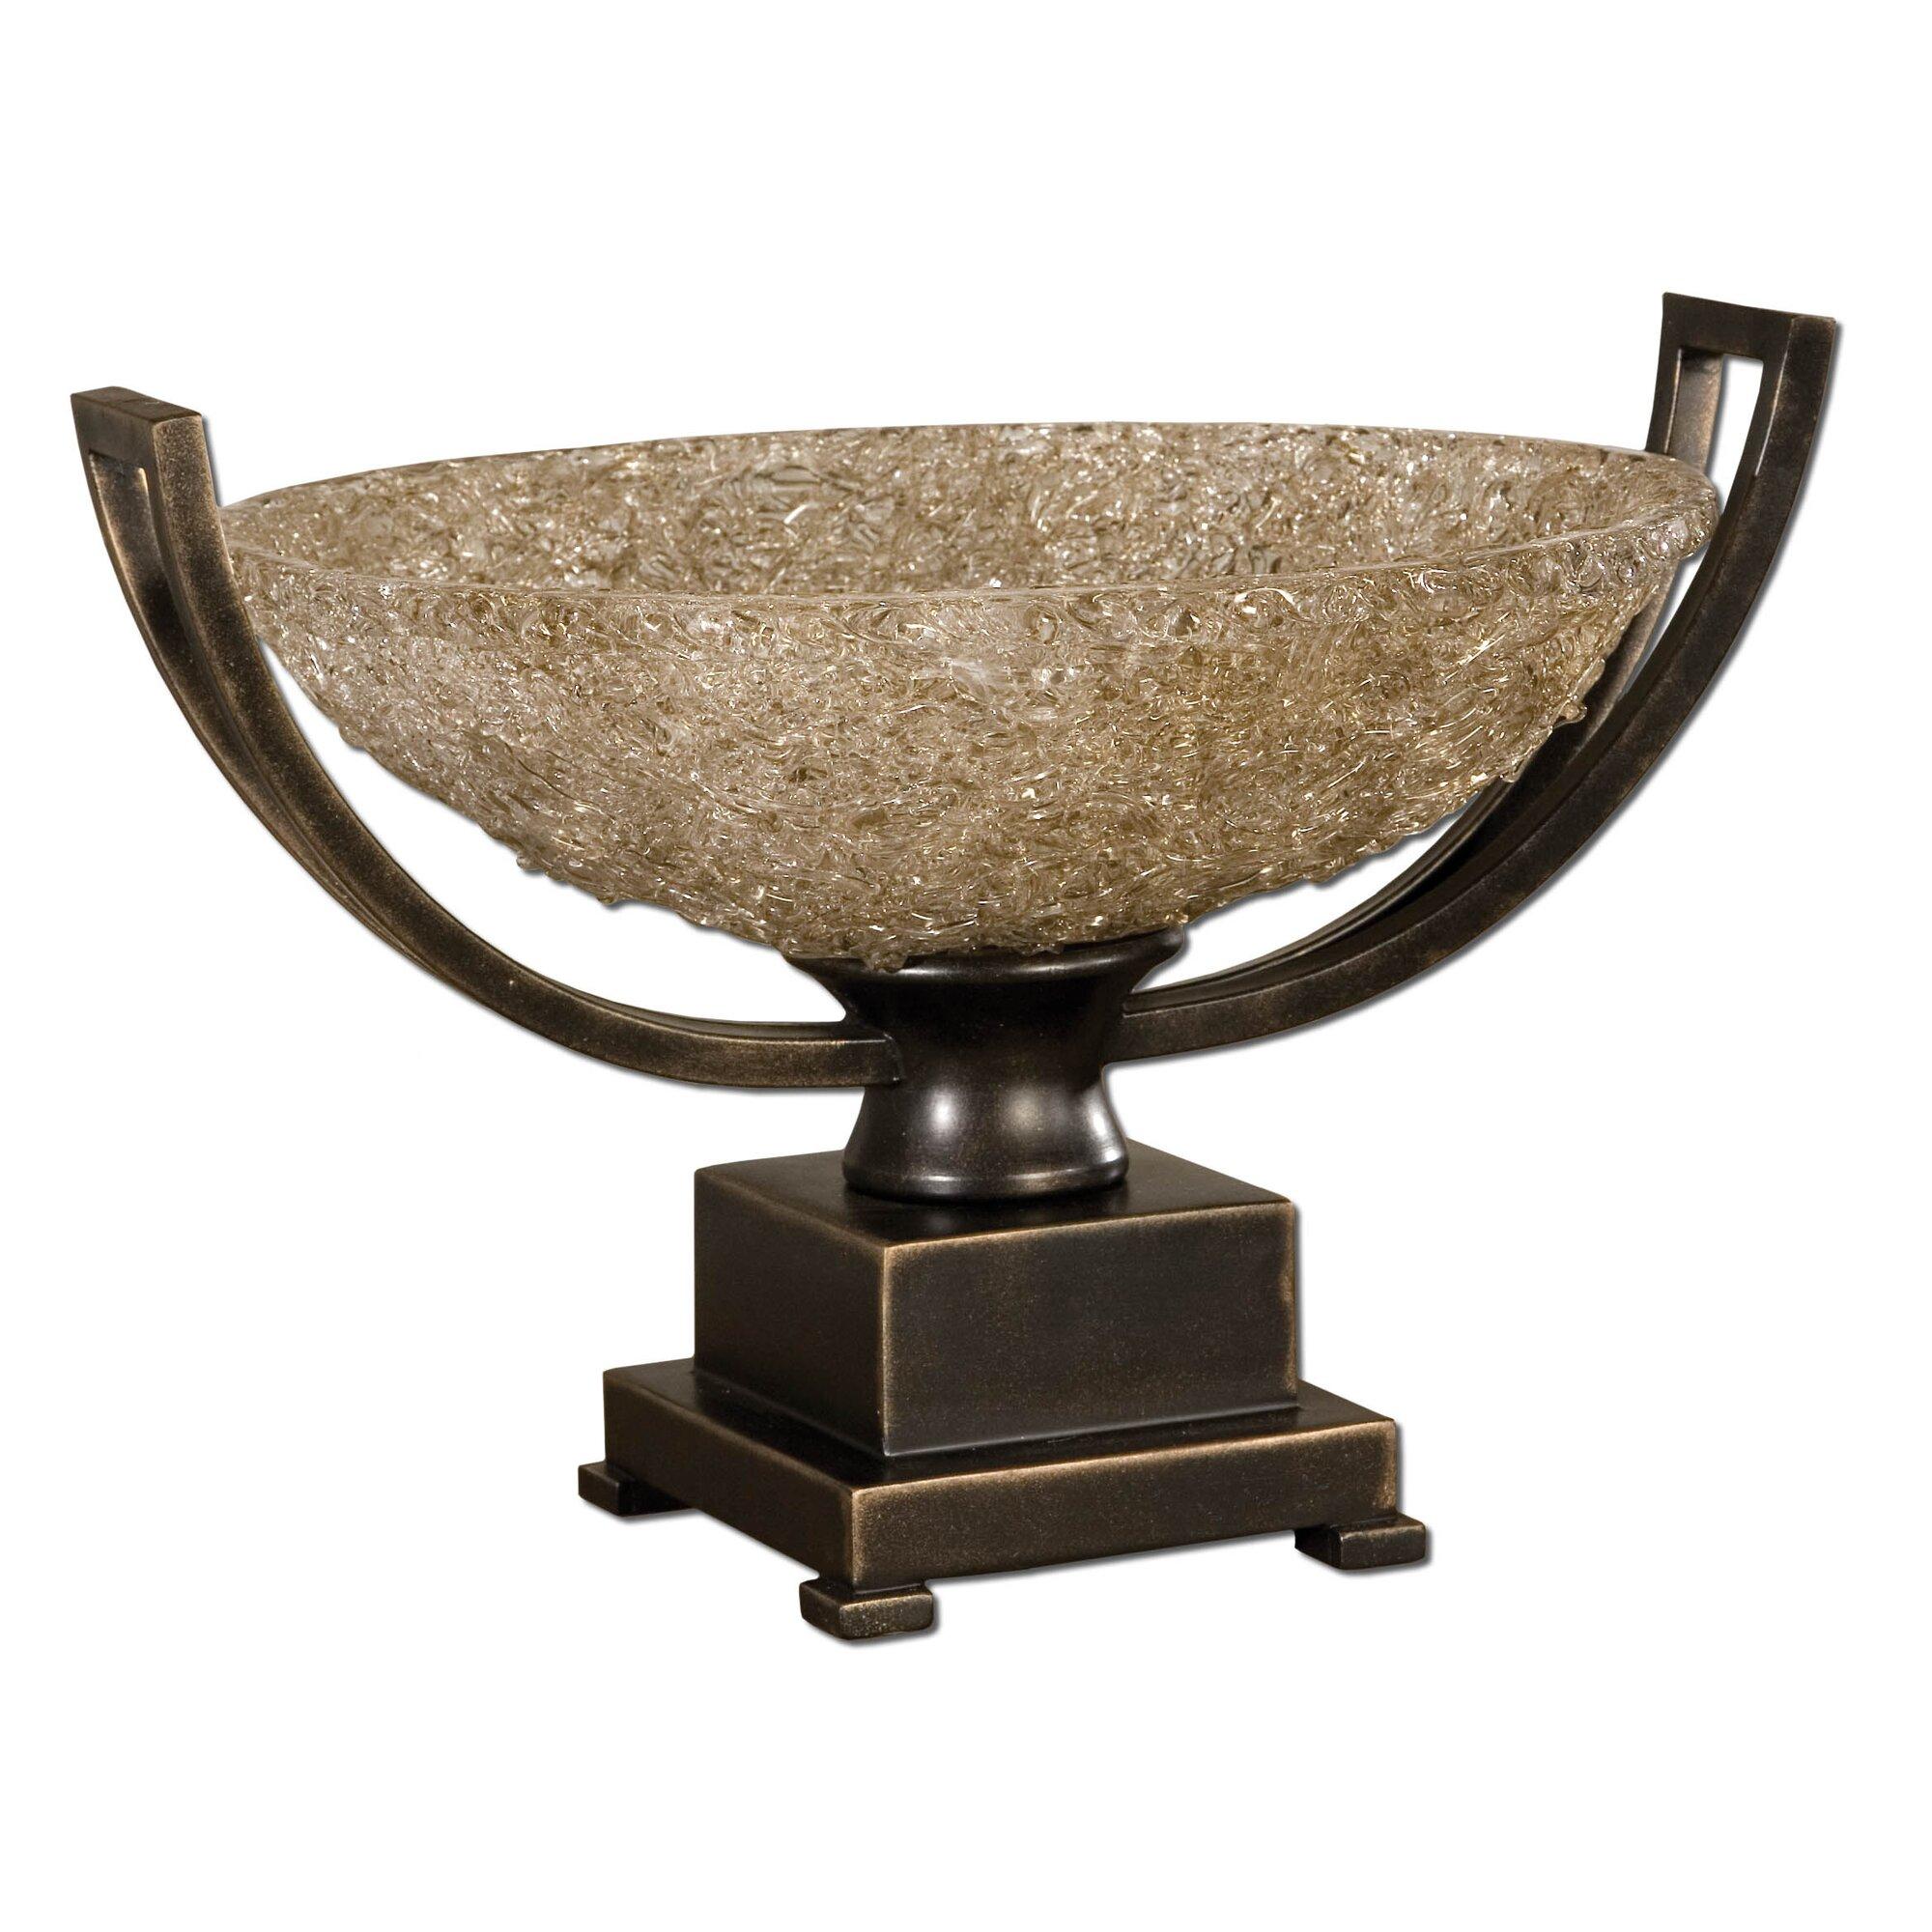 palace centerpiece decorative bowl - Decorative Bowl